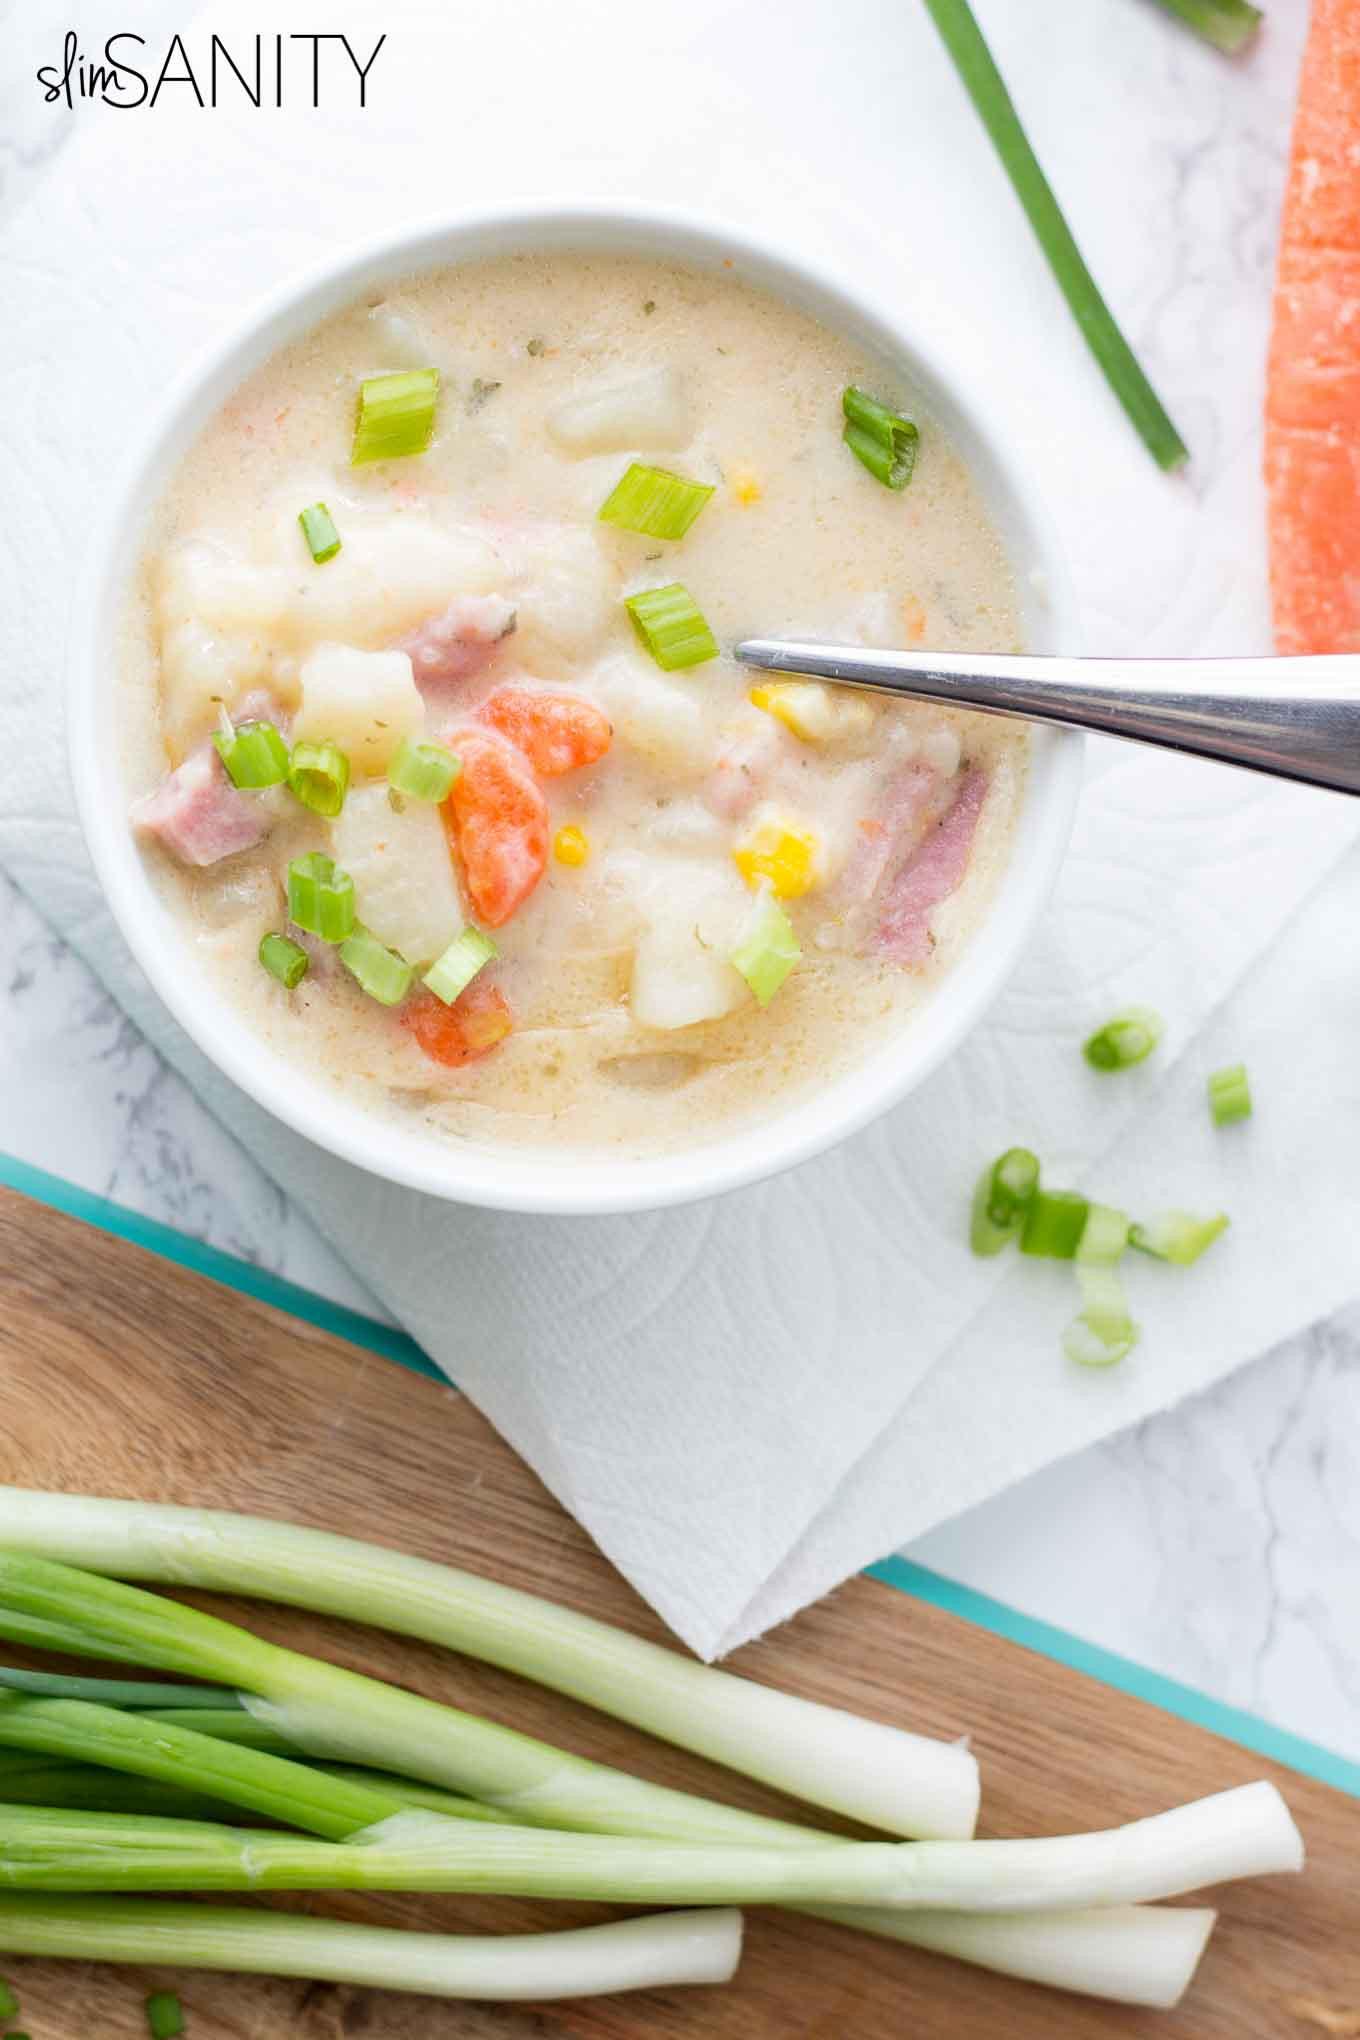 Healthy Potato Soup  Healthy Loaded Potato Soup Slim Sanity